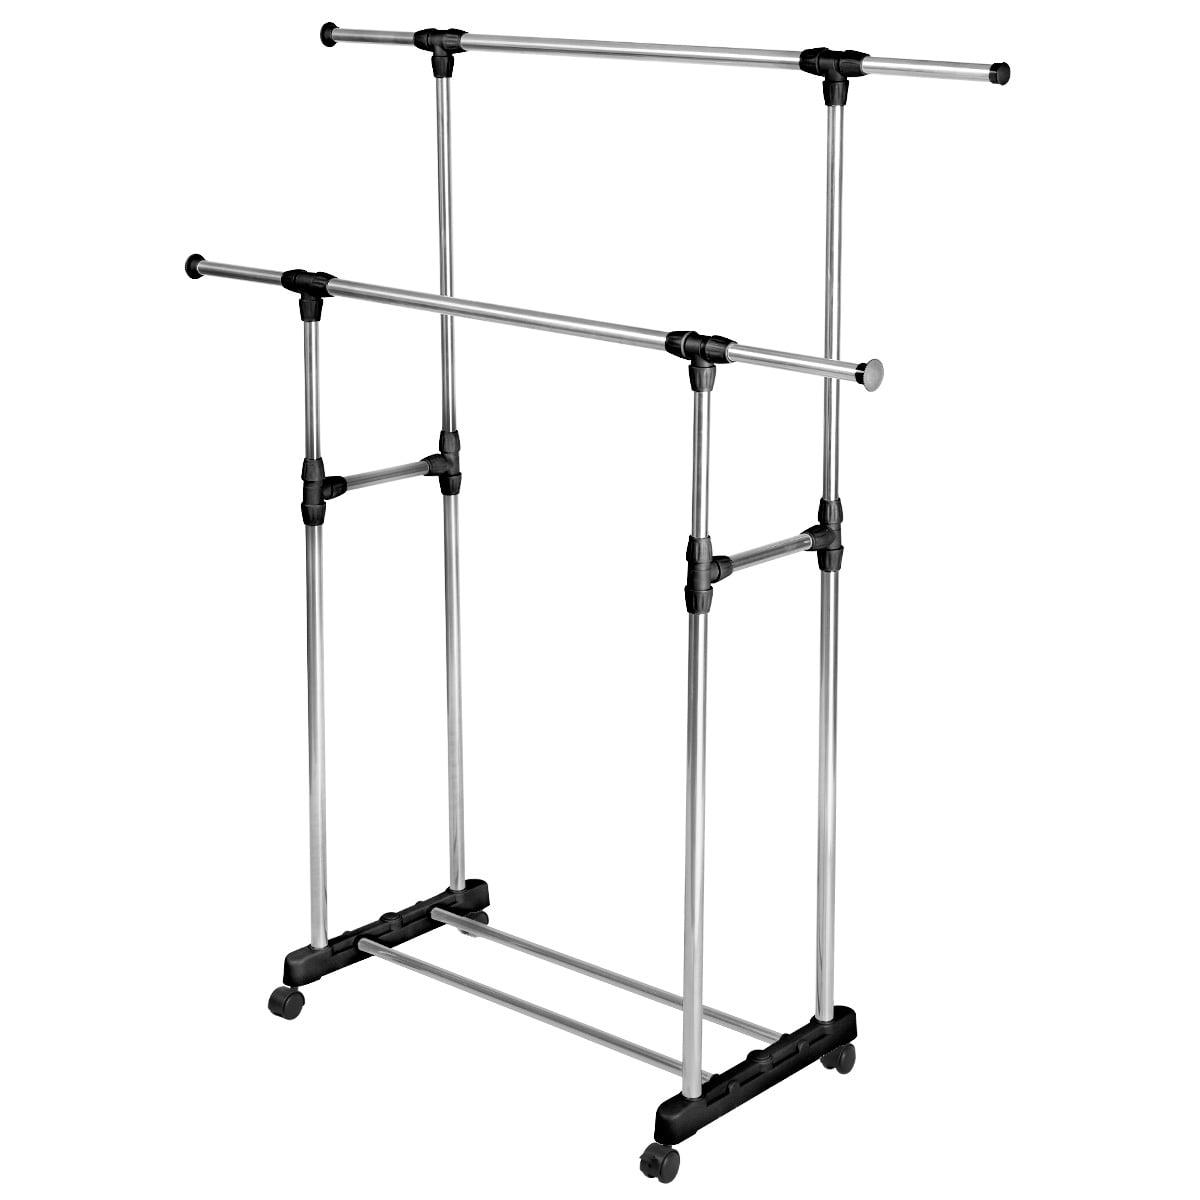 costway heavy dutydouble adjustable portable clothes rack hanger extendable rolling walmartcom